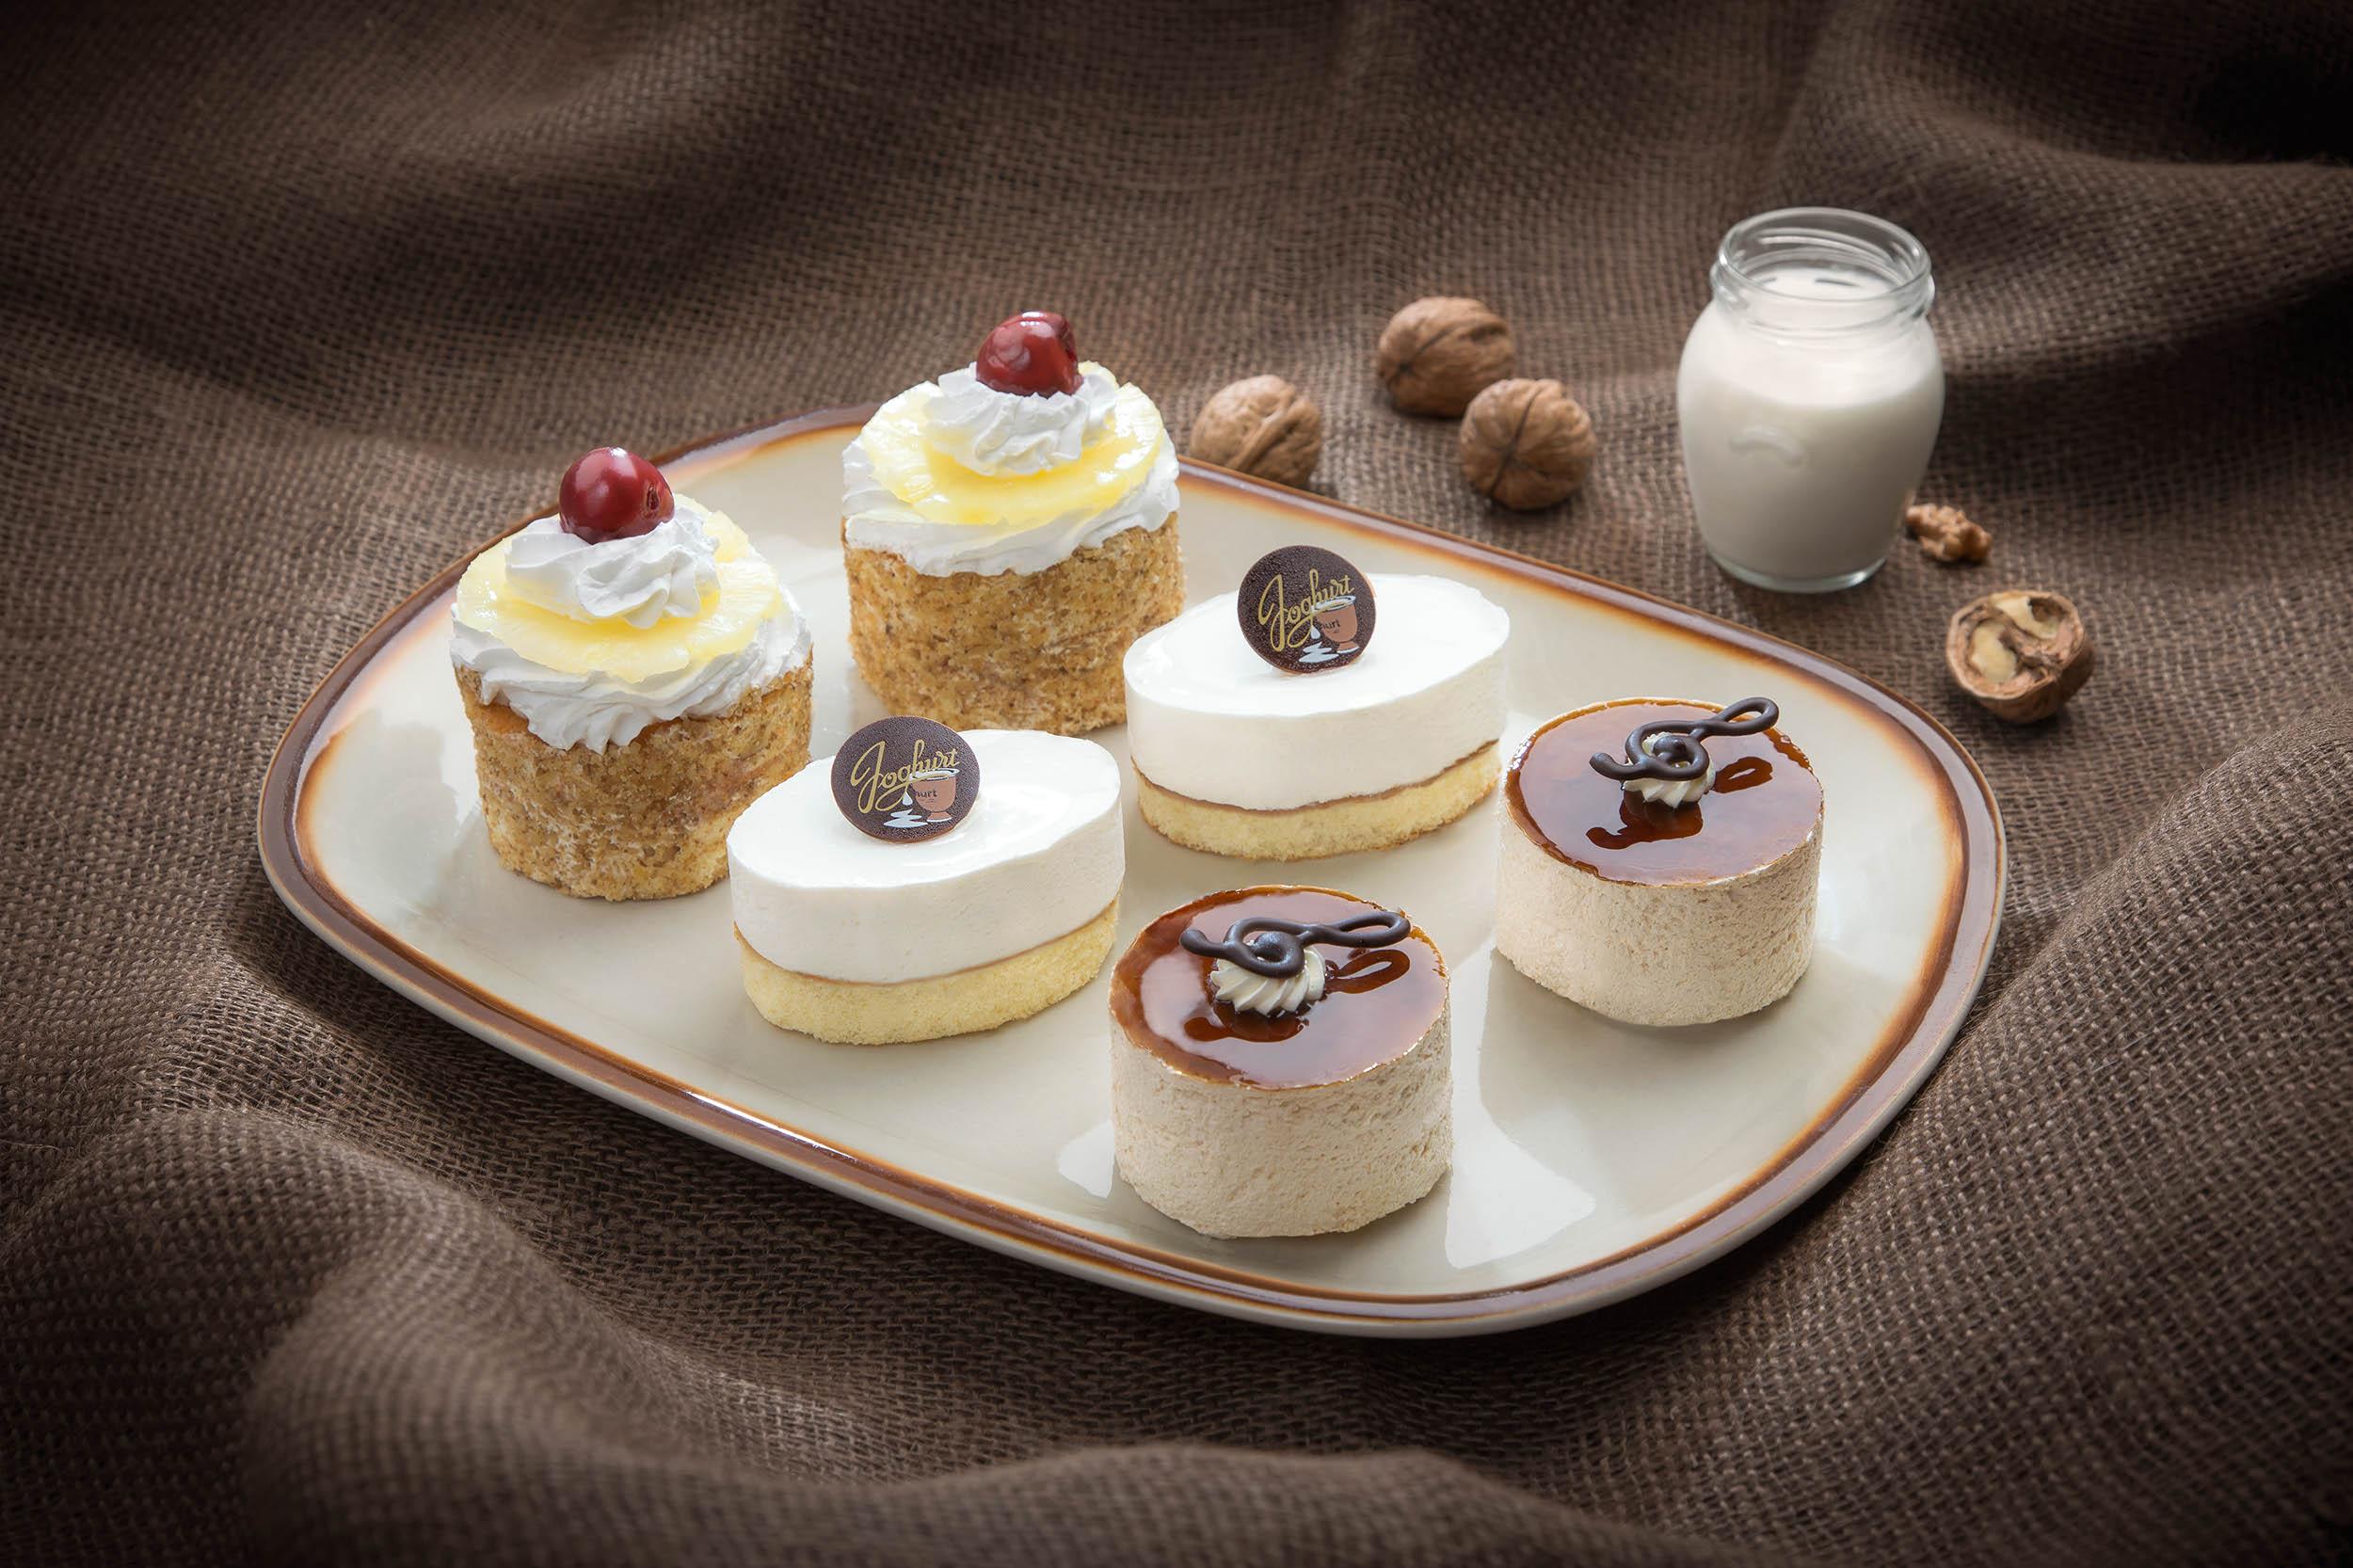 Výroba a prodej, dodávka, rozvoz pekařských a cukrářských výrobků